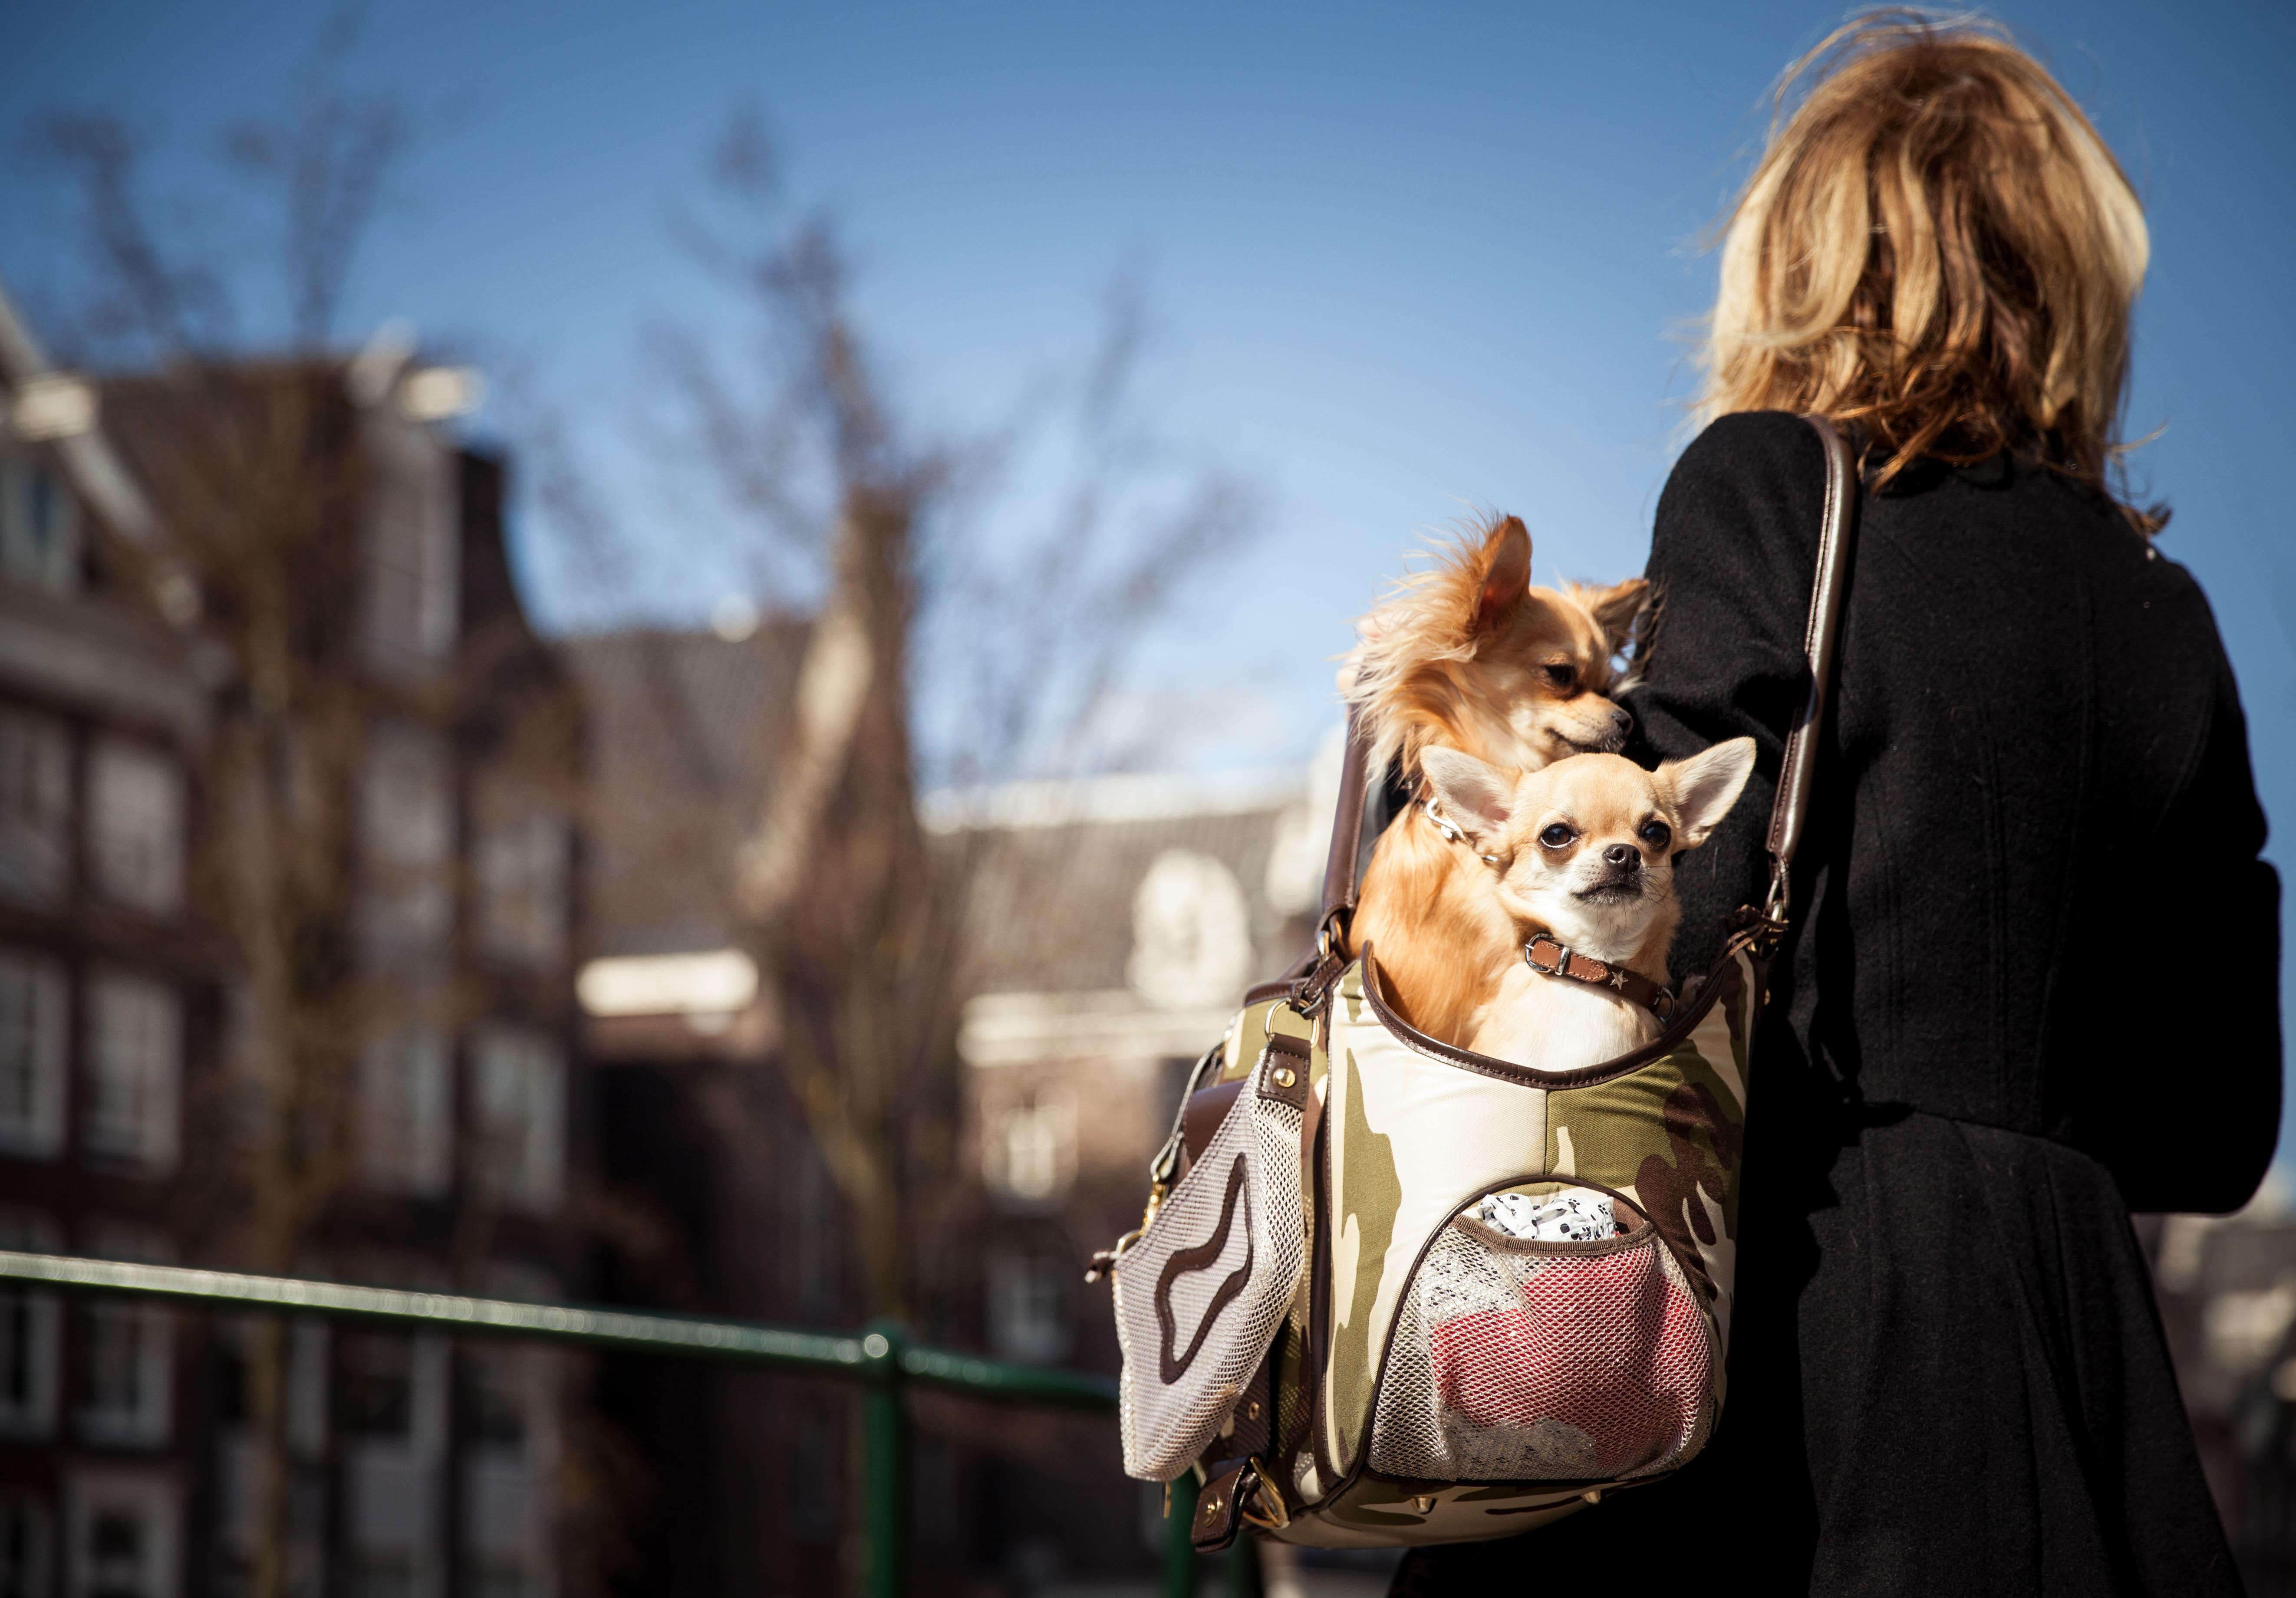 Infographic: The Customer Journey of Pet CBD Buyers